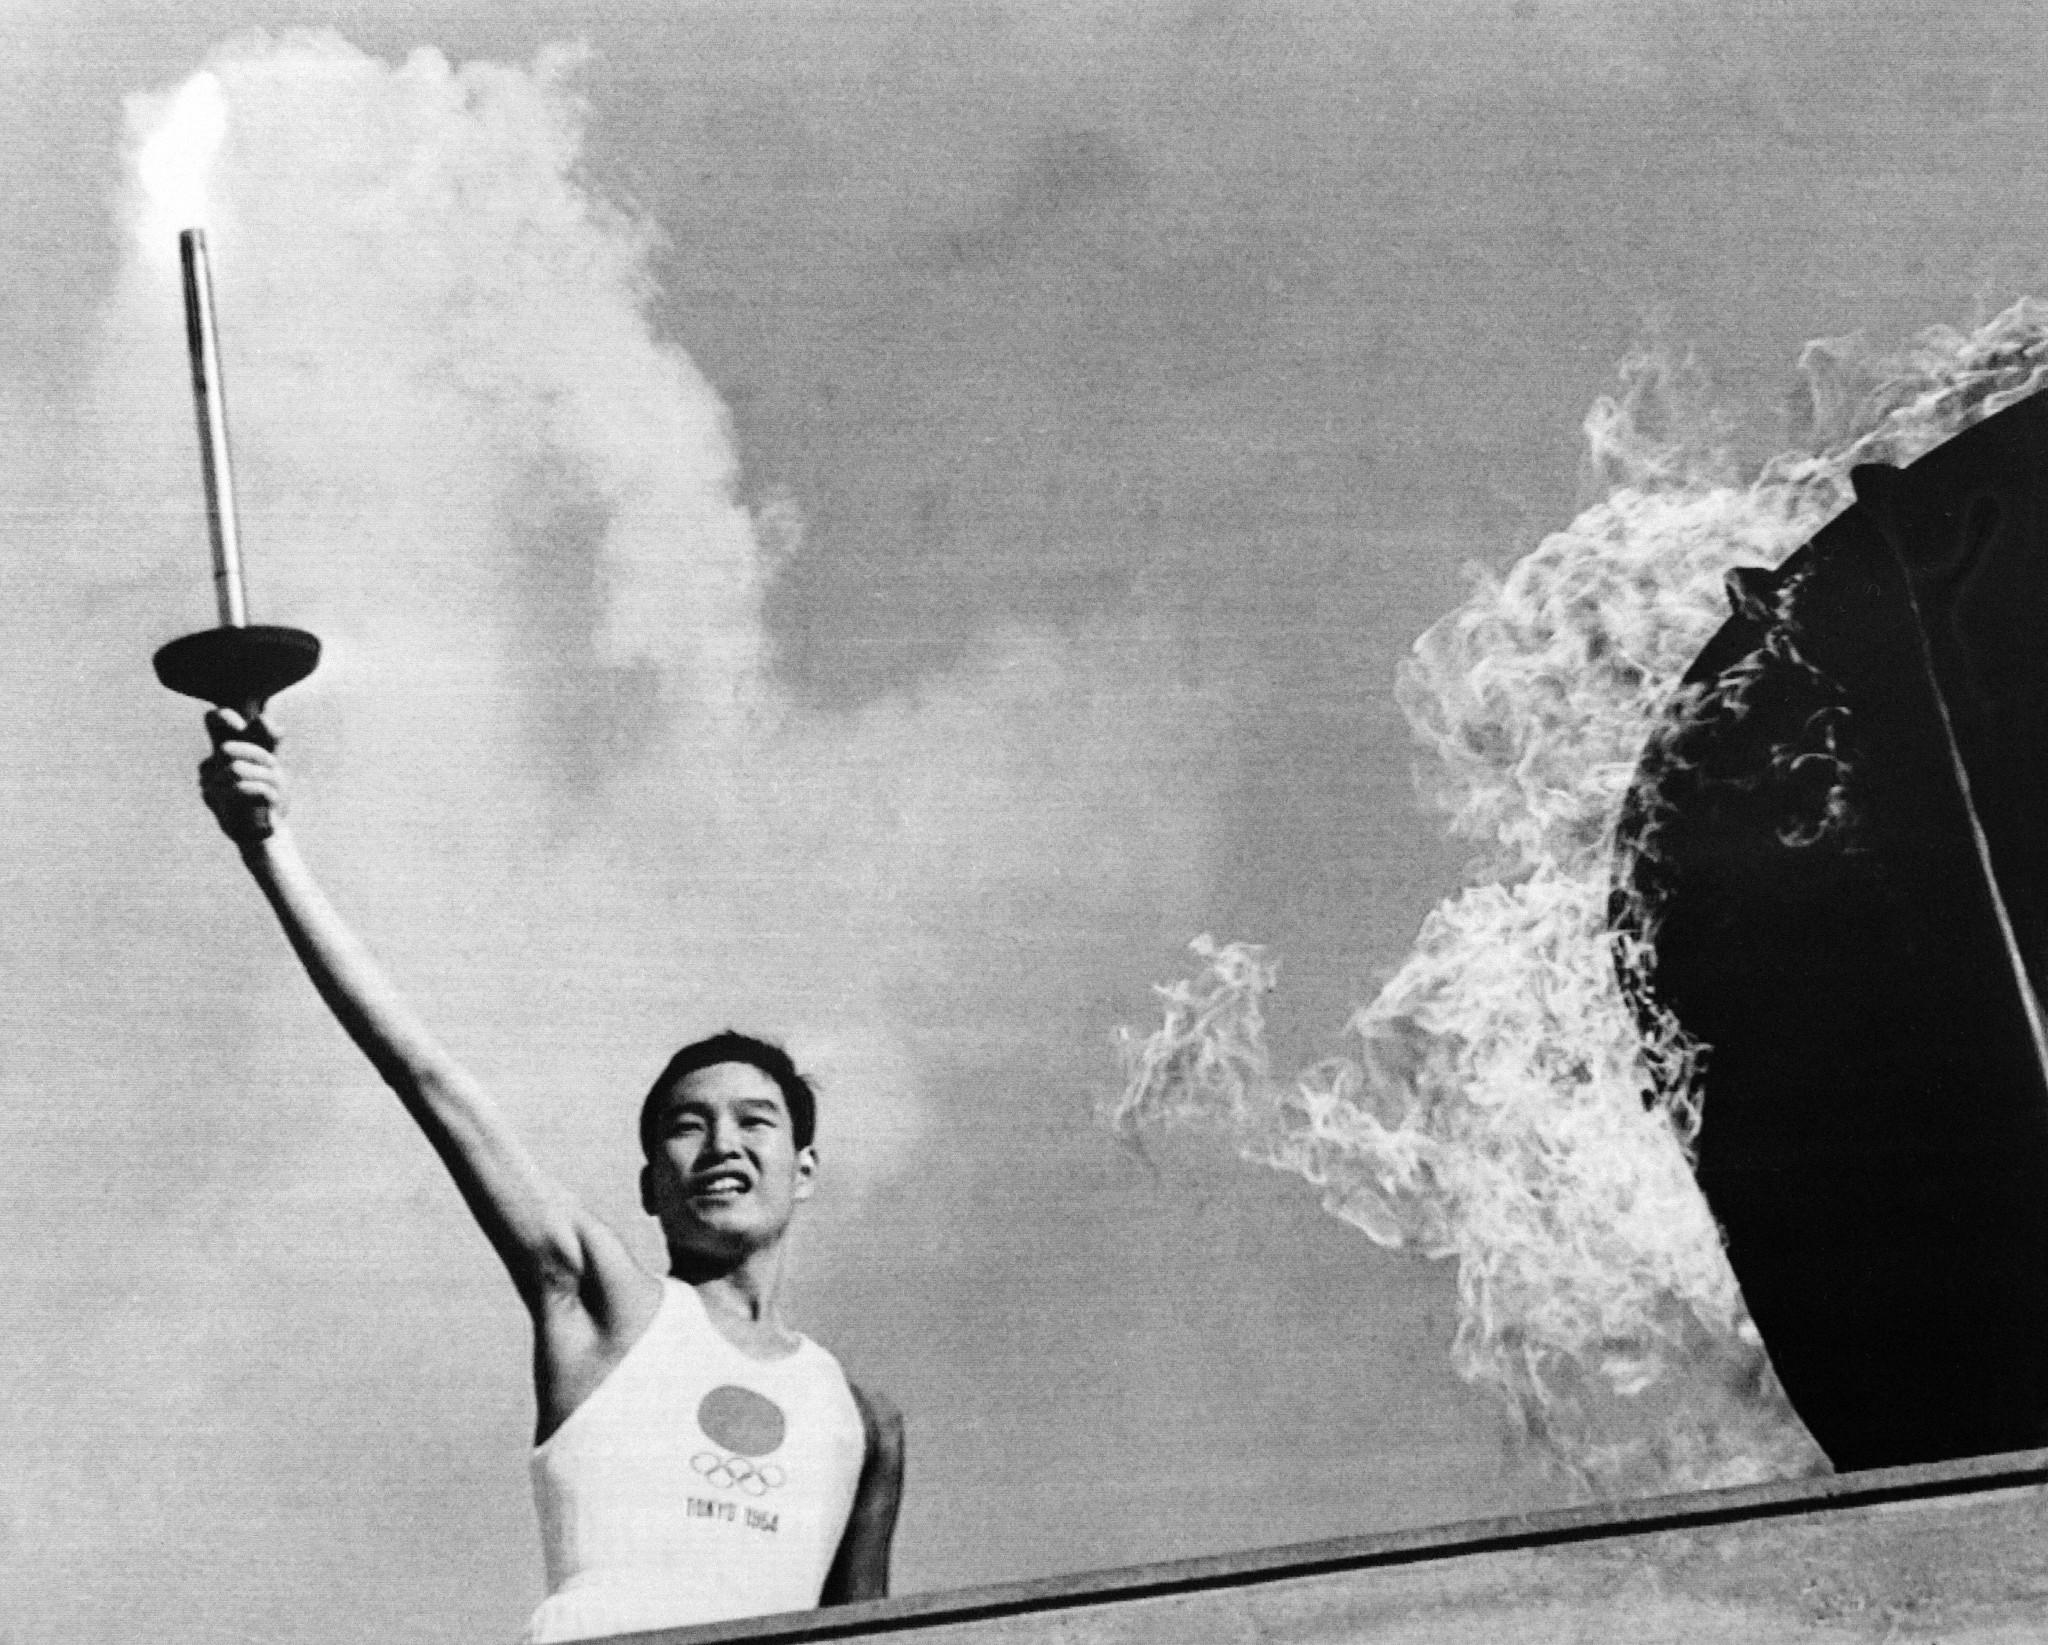 Yoshinori Sakai lit the Olympic Cauldron at the Tokyo 1964 Opening Ceremony ©Getty Images